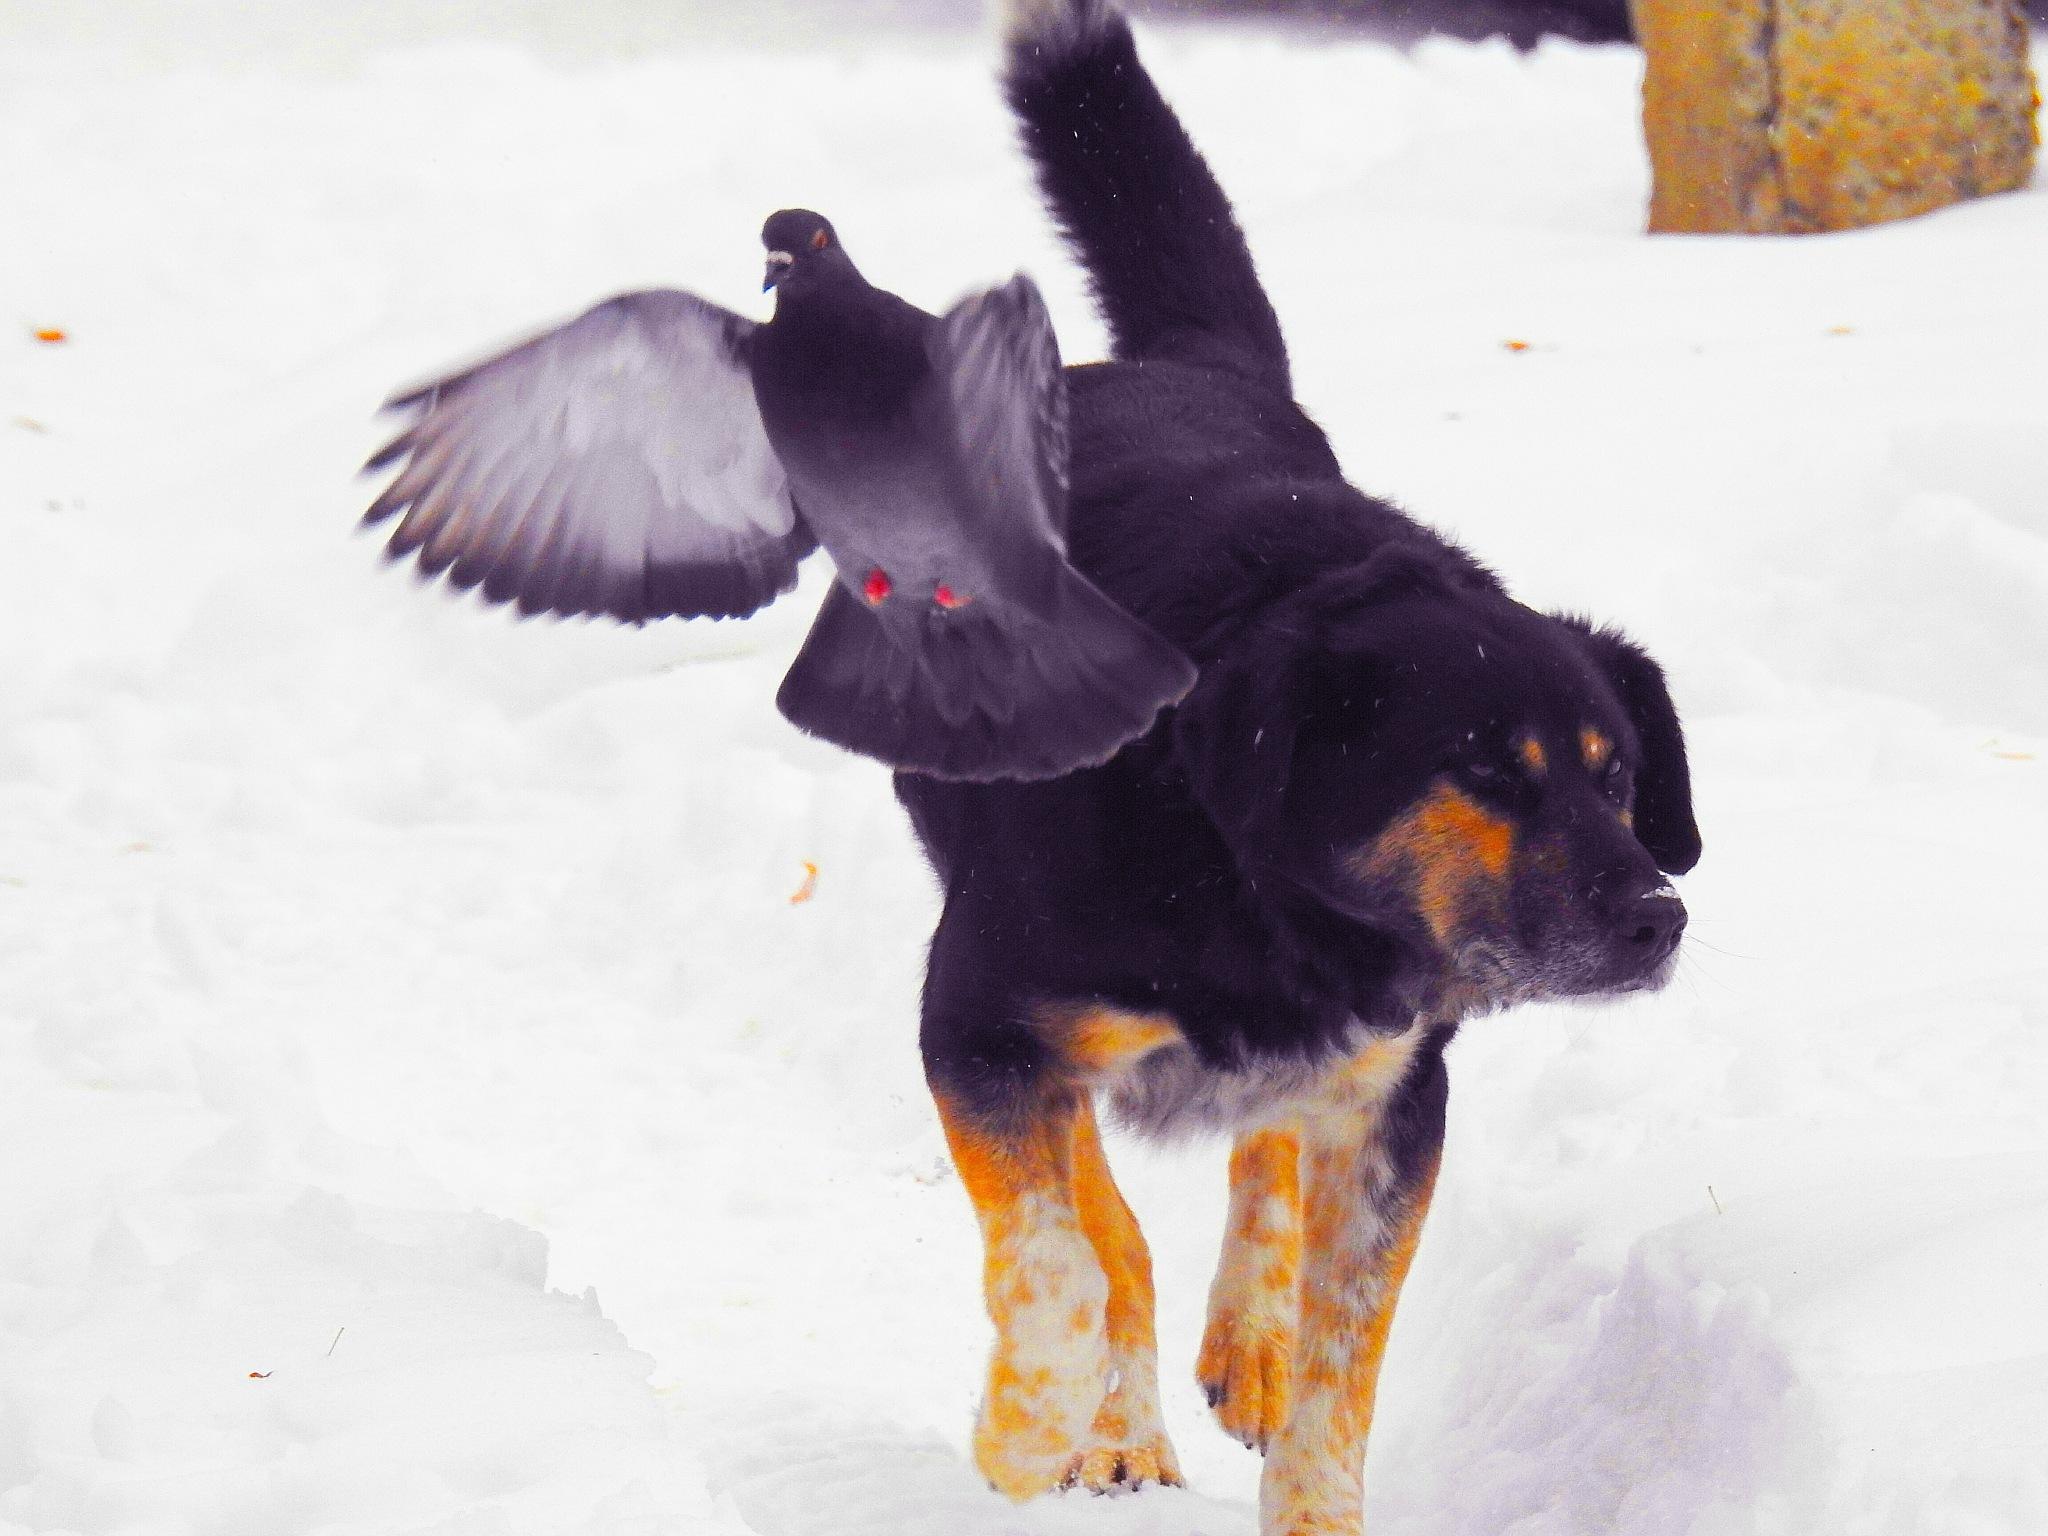 Dog and Pigeon  by sergey.parfeniuk